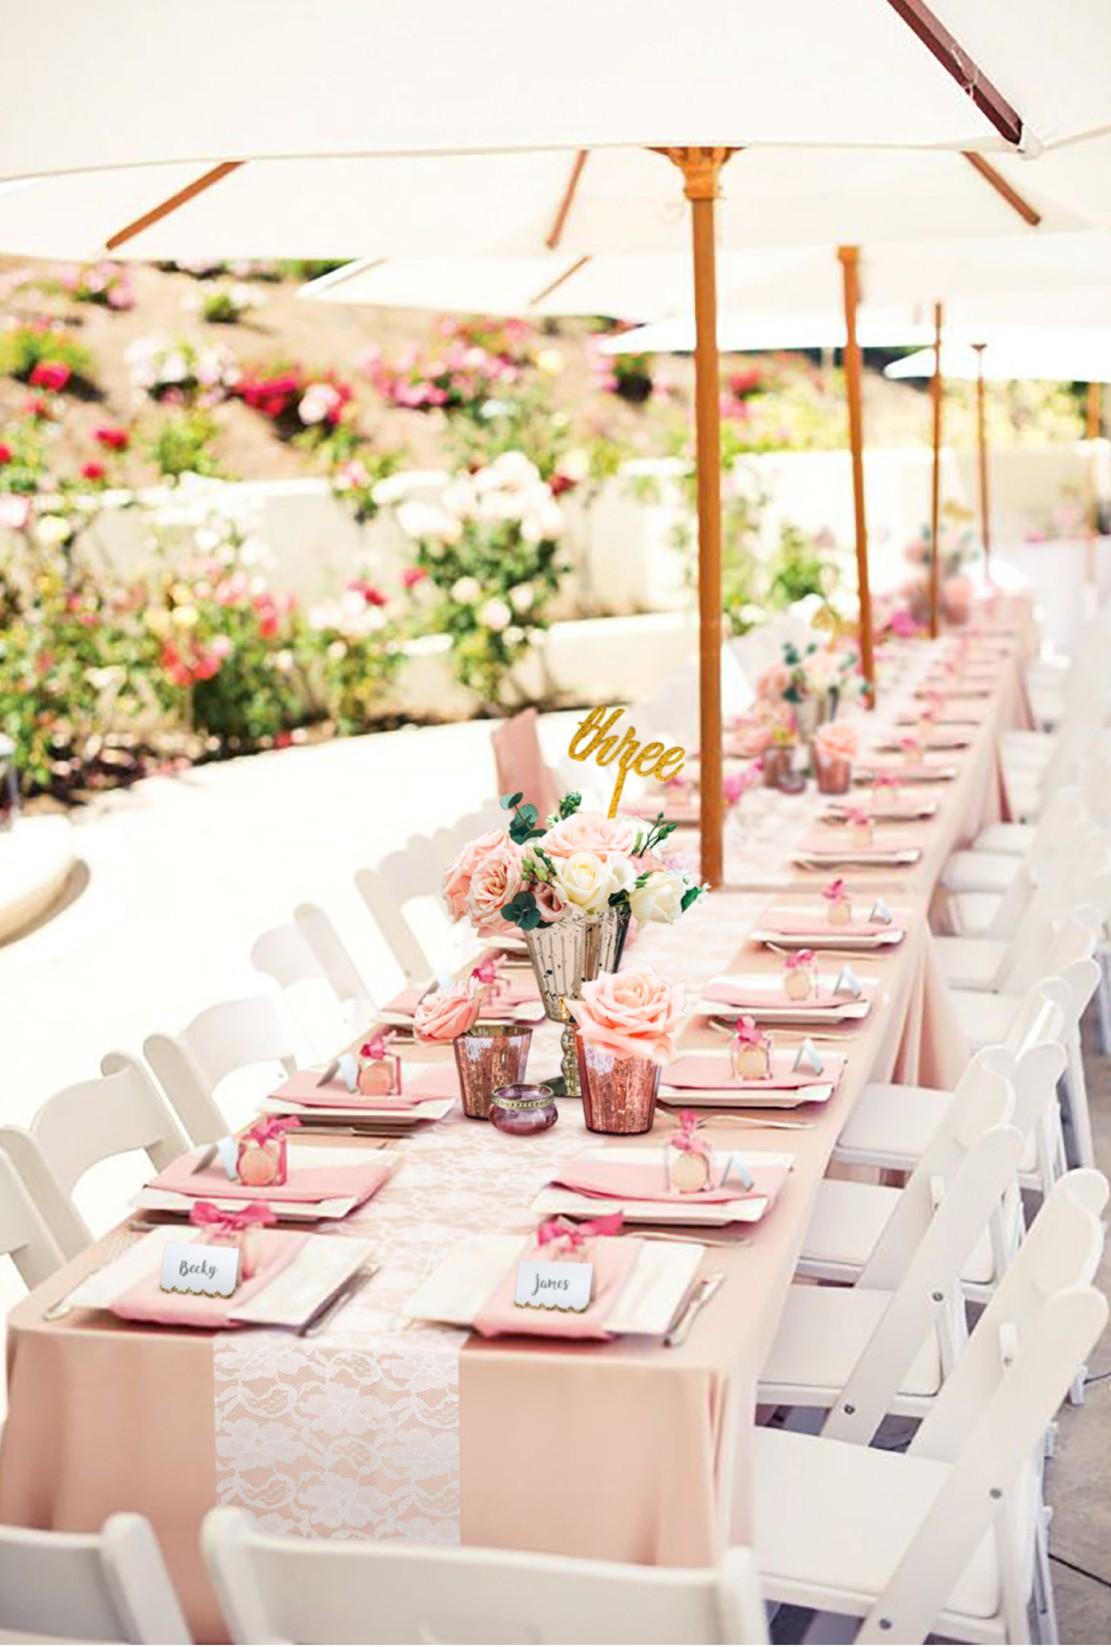 styleboxe Rose Pinks Wedding Table Decor